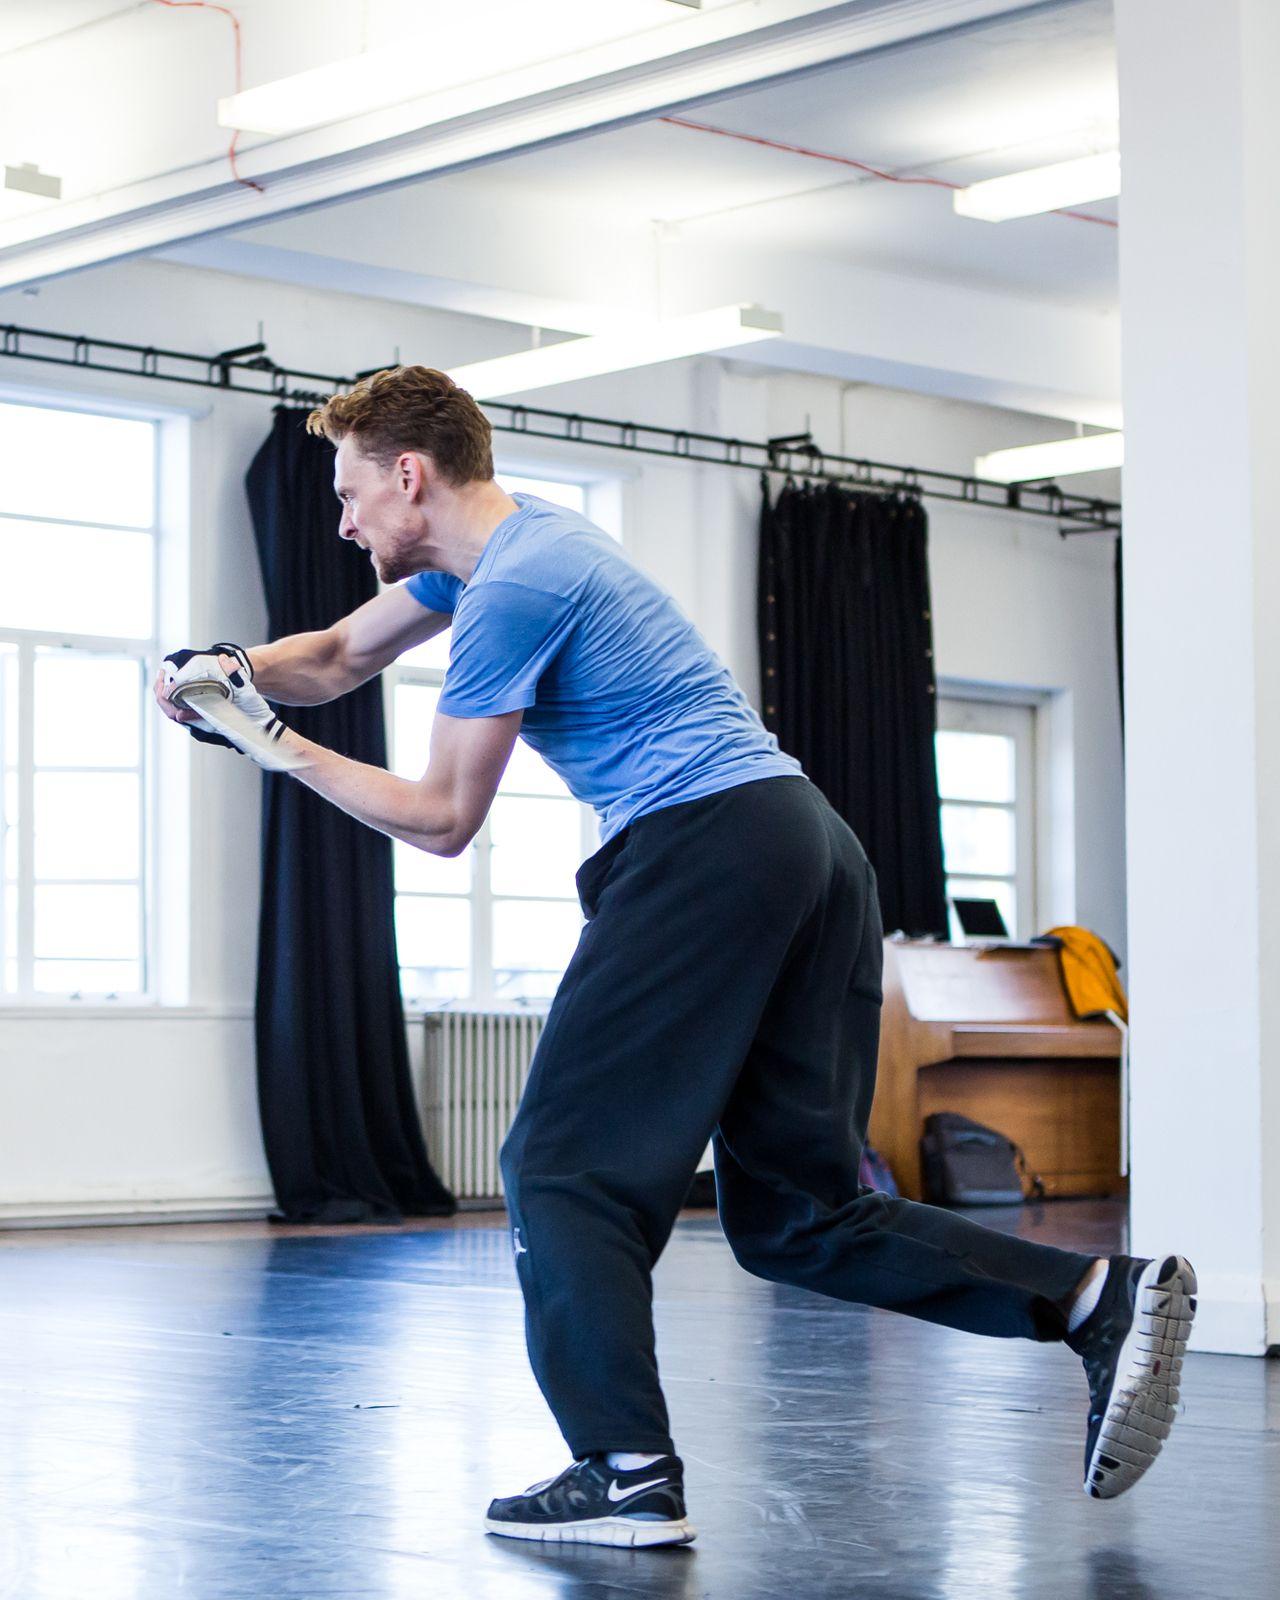 Tom Hiddleston during the rehearsal of 'Coriolanus' on September 30, 2013 [5x HQ]